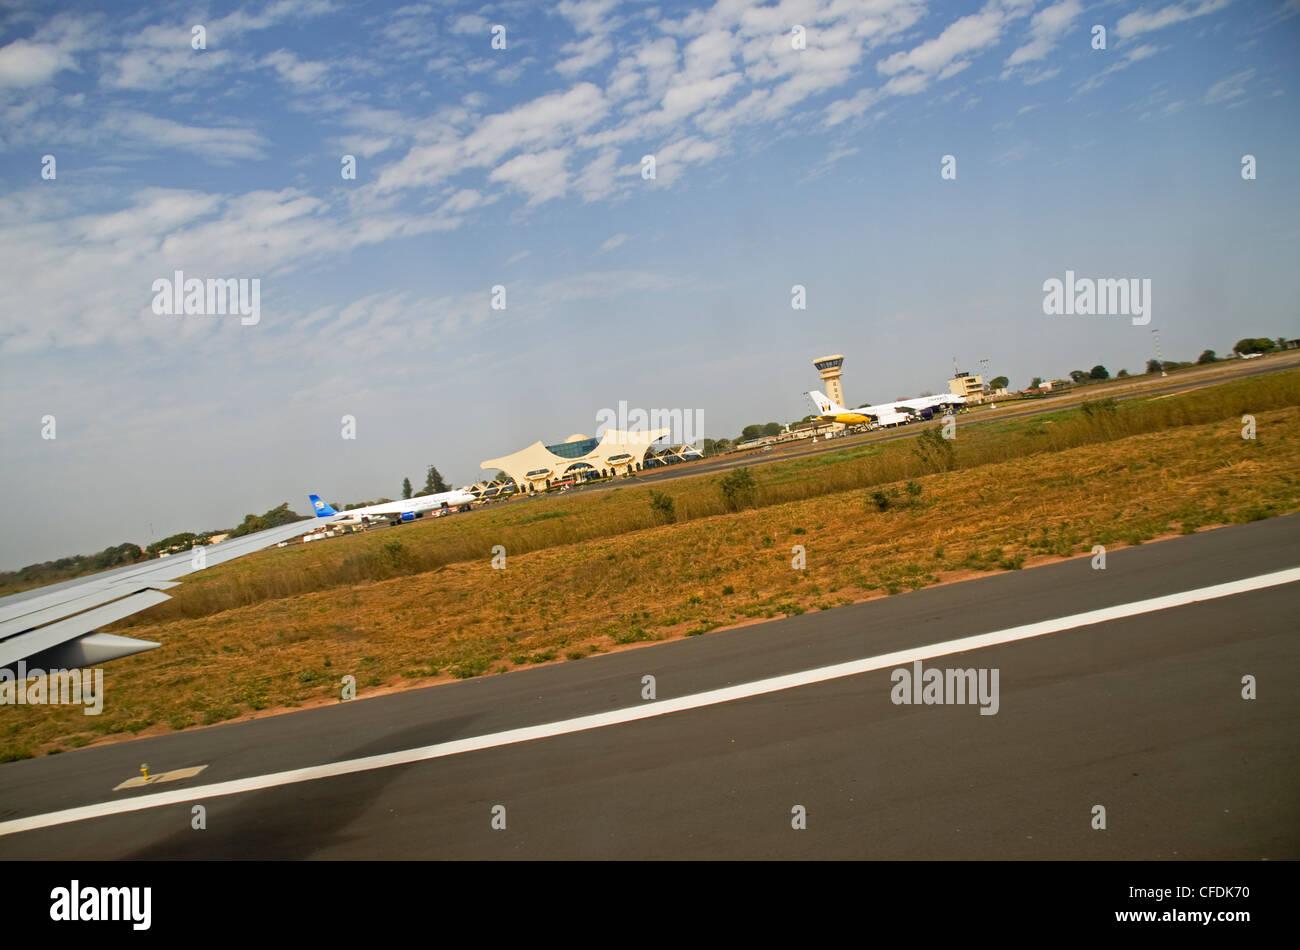 Yundum International Airport Banjul Gambia west Africa - Stock Image